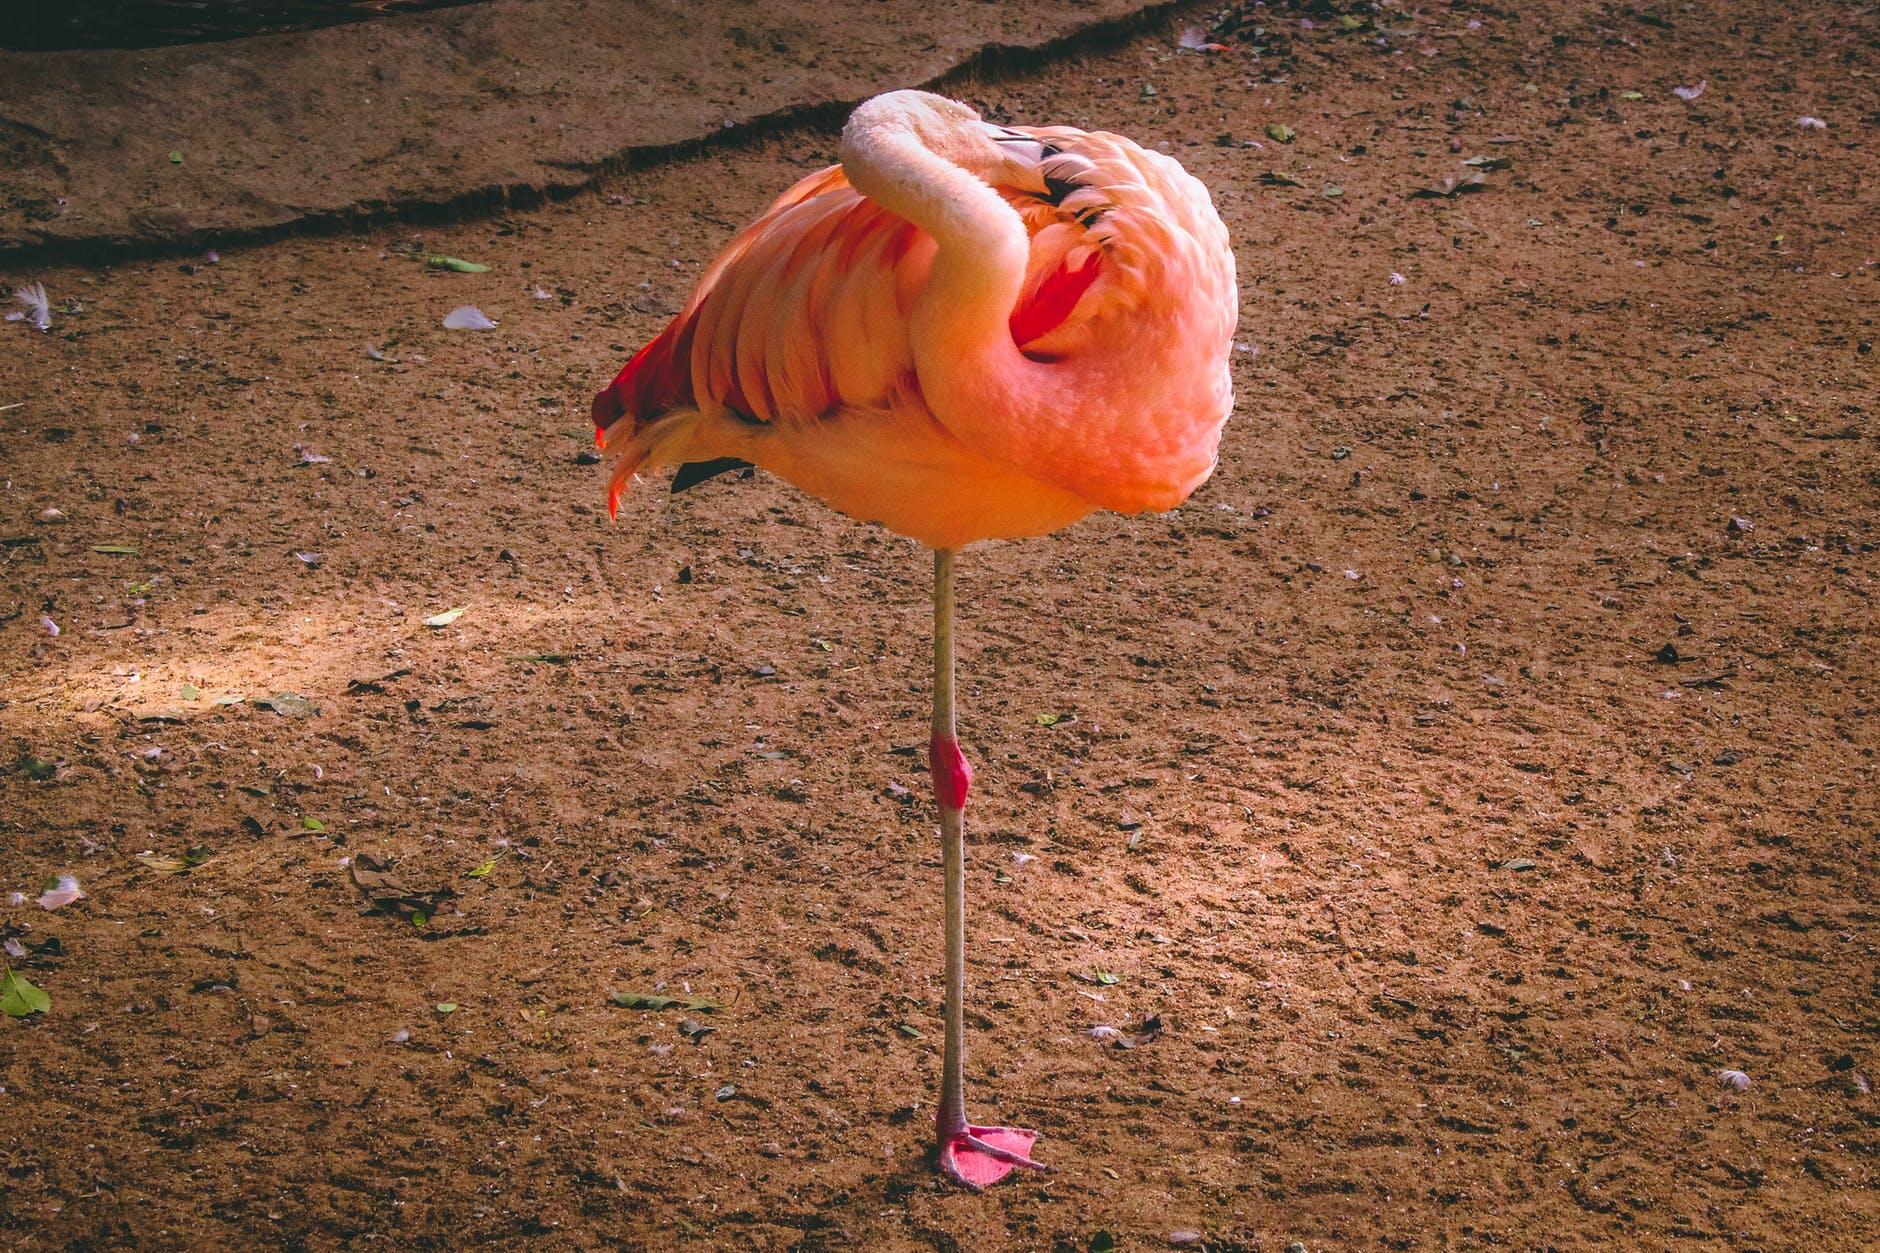 flamingo standing on brown soil